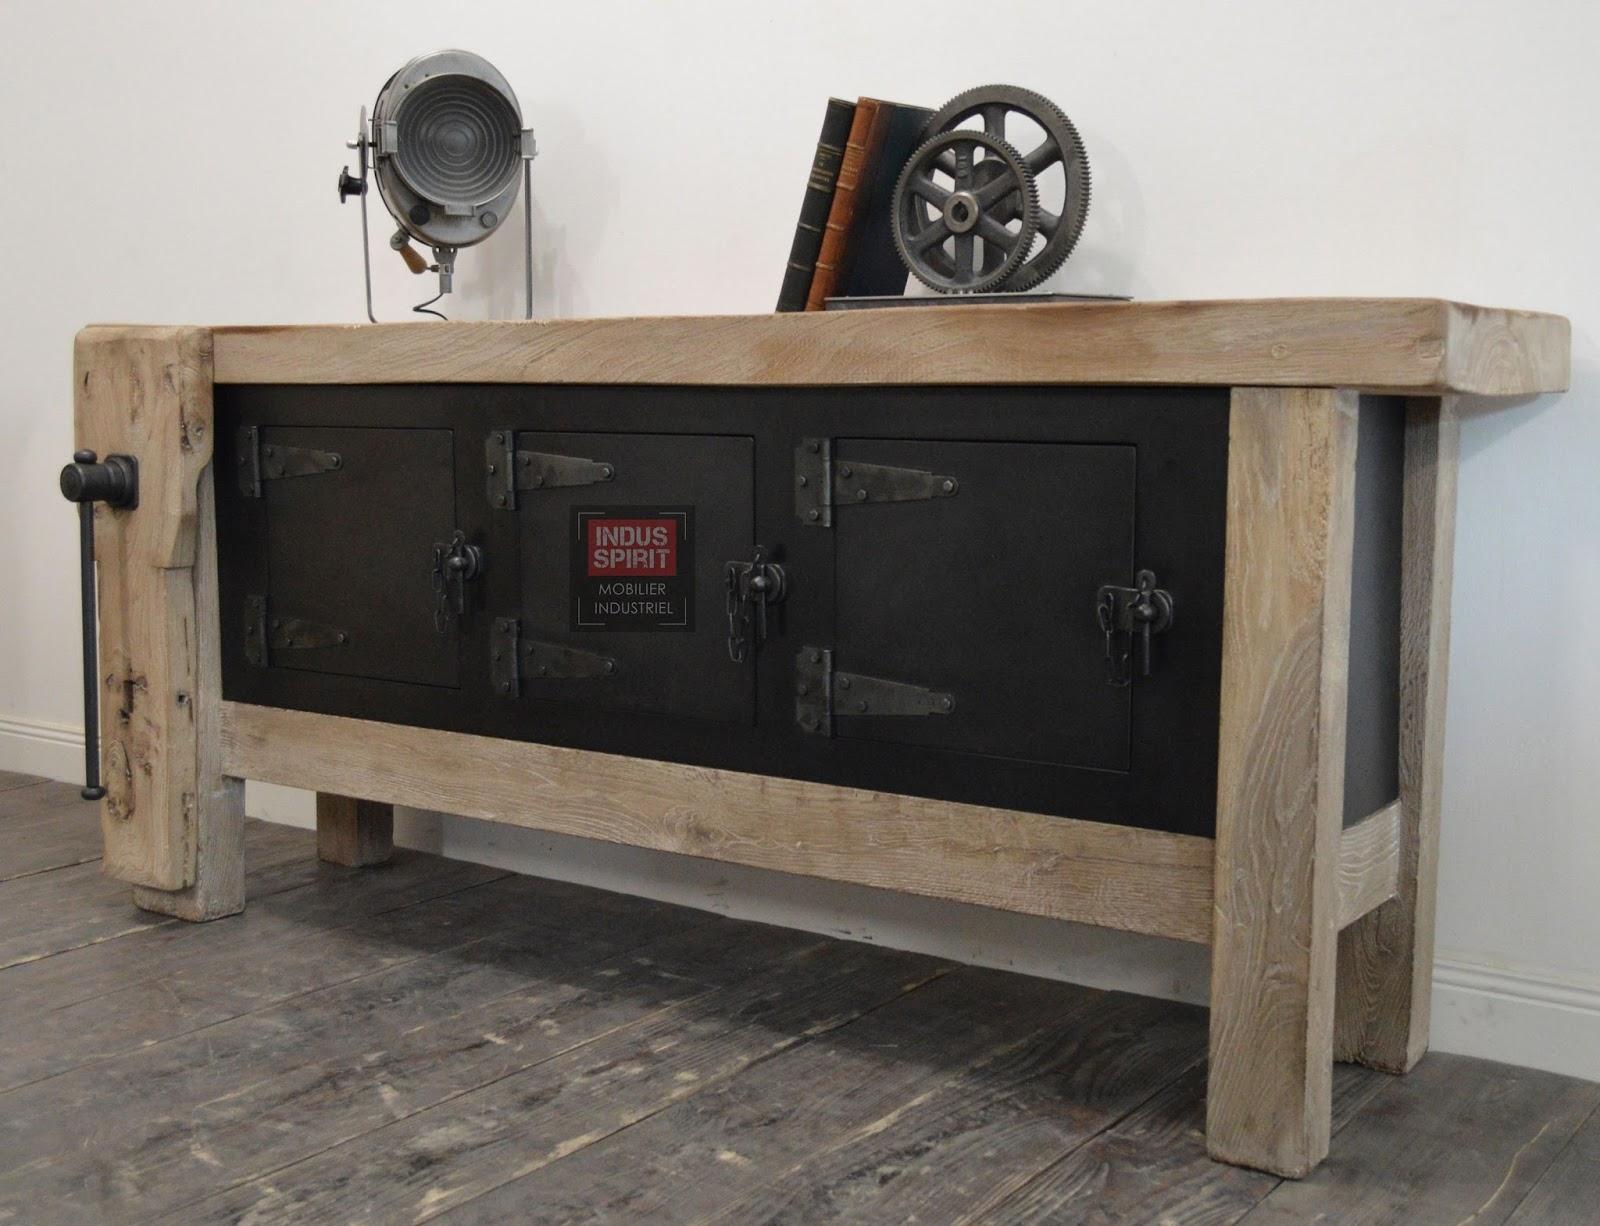 etabli ancien vritable meuble de superbe tabli ancien. Black Bedroom Furniture Sets. Home Design Ideas